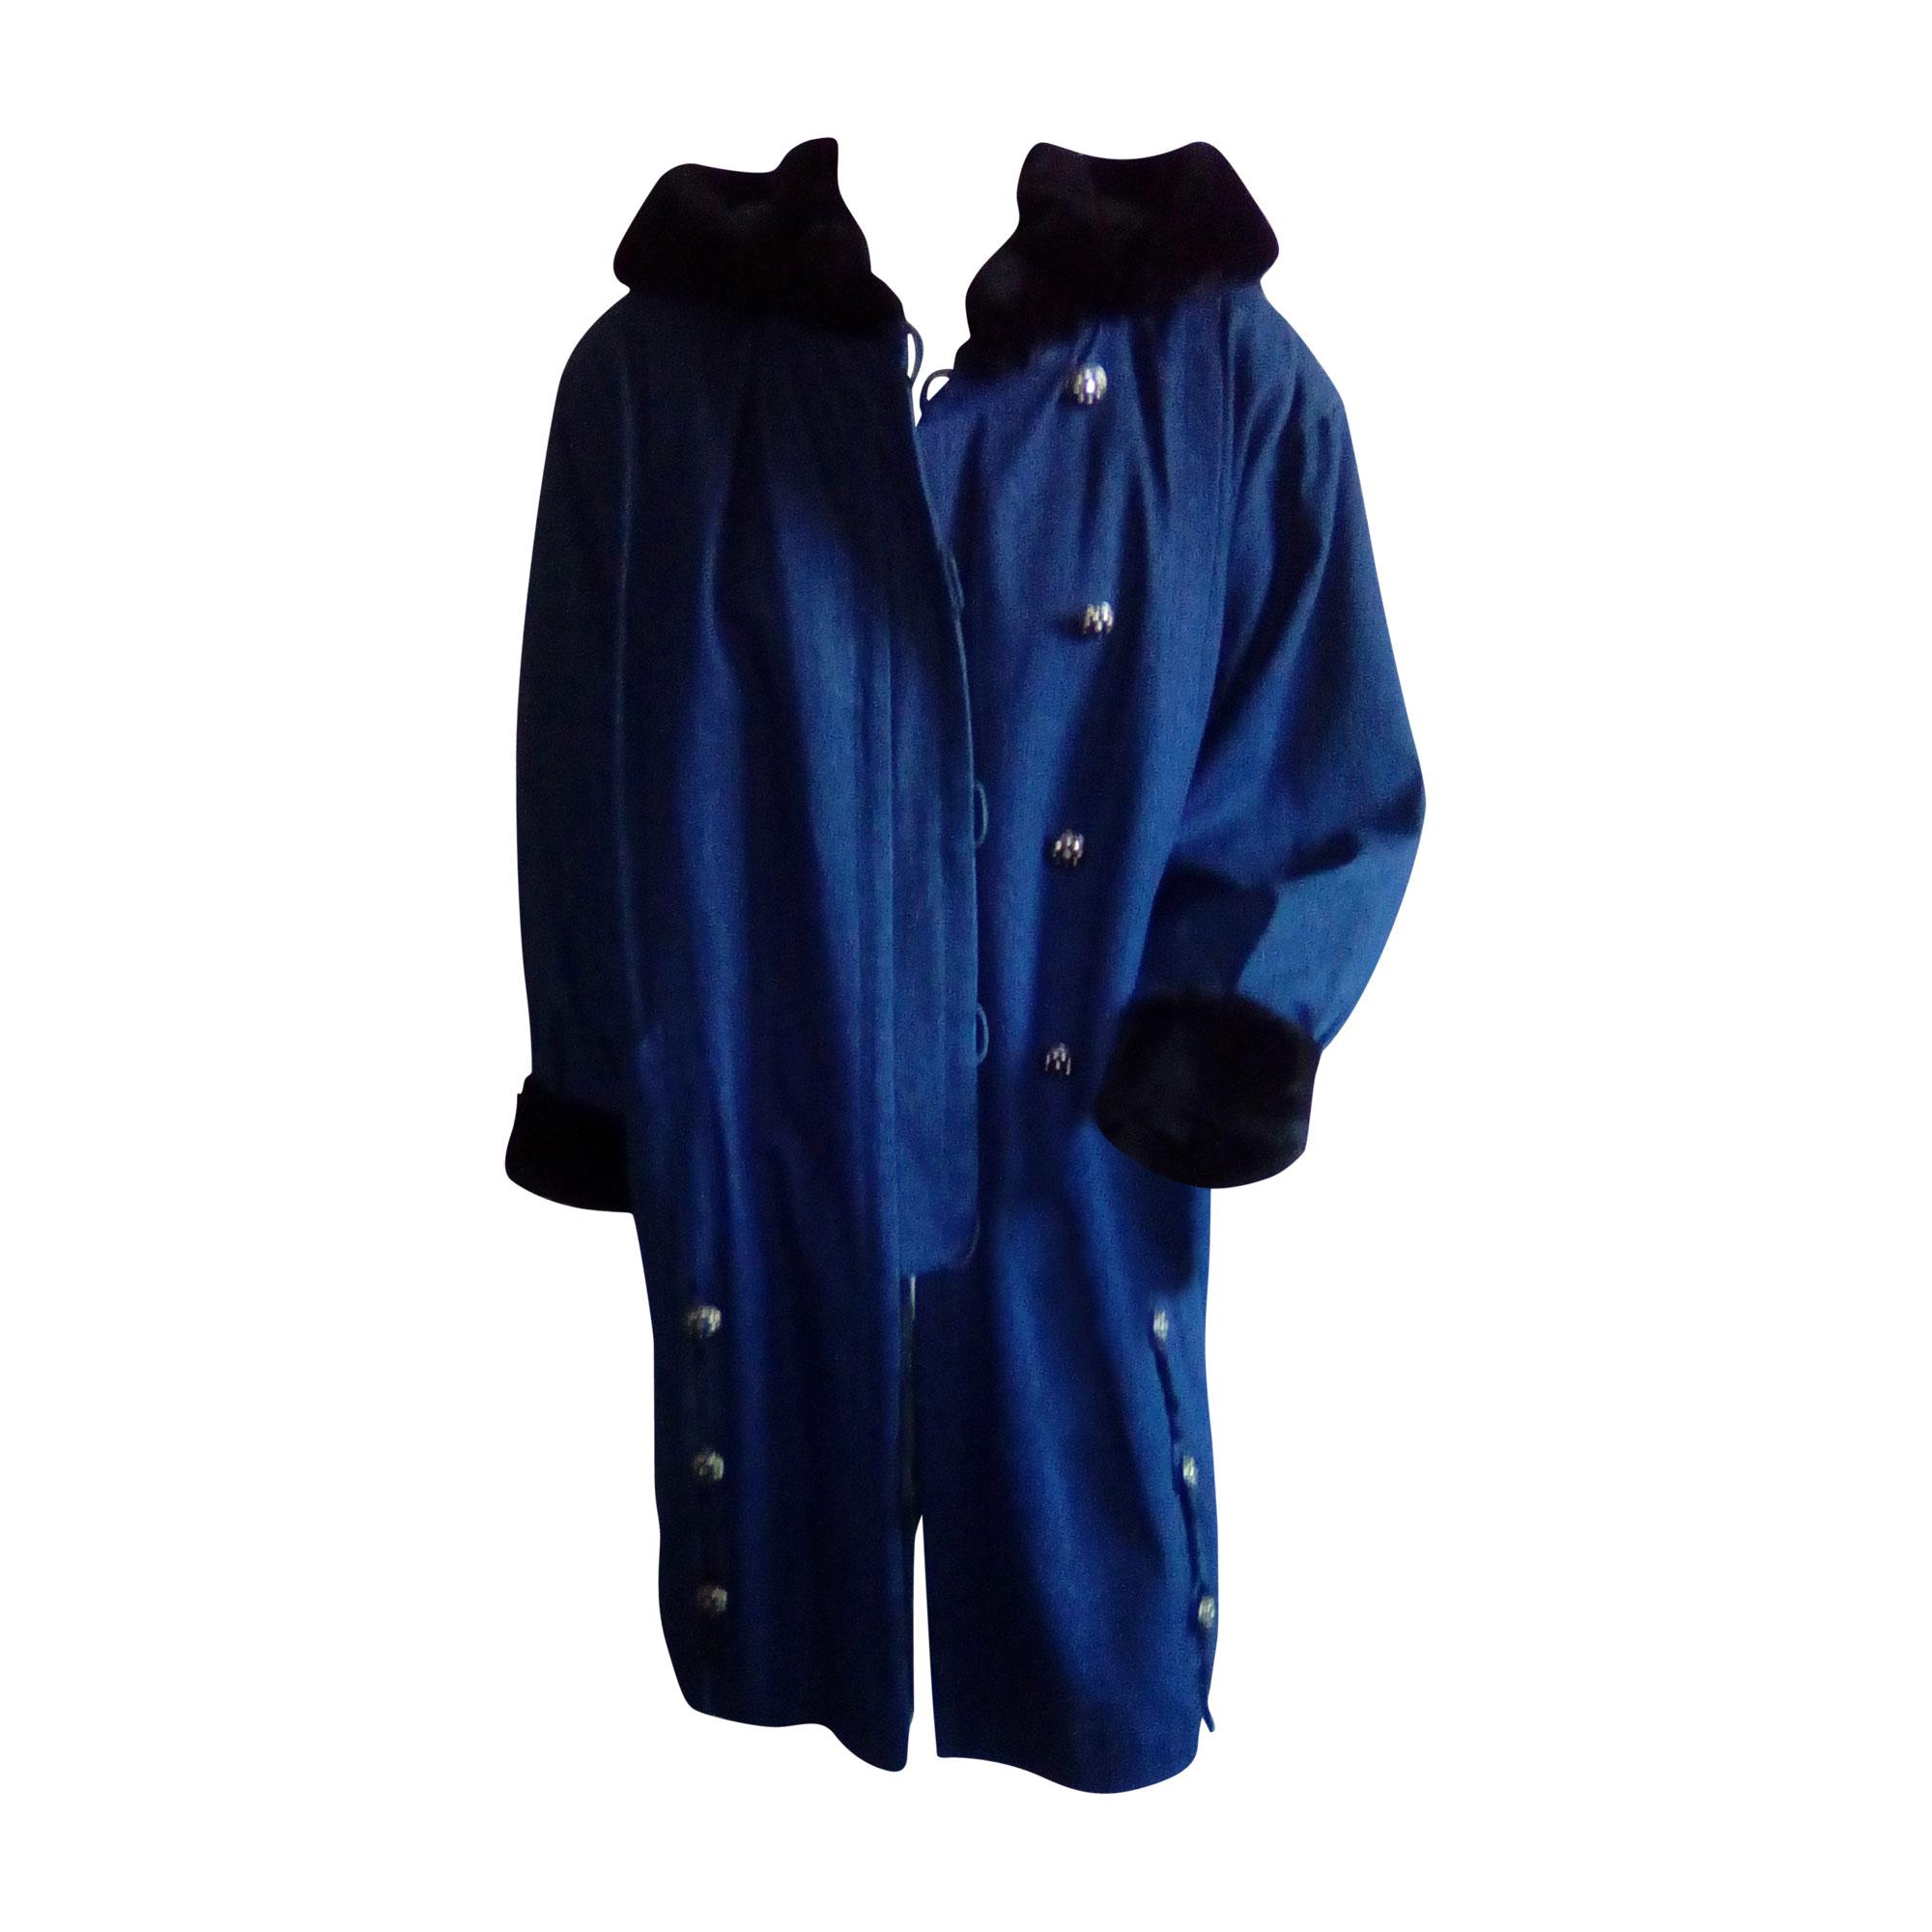 Manteau YVES SAINT LAURENT Bleu, bleu marine, bleu turquoise